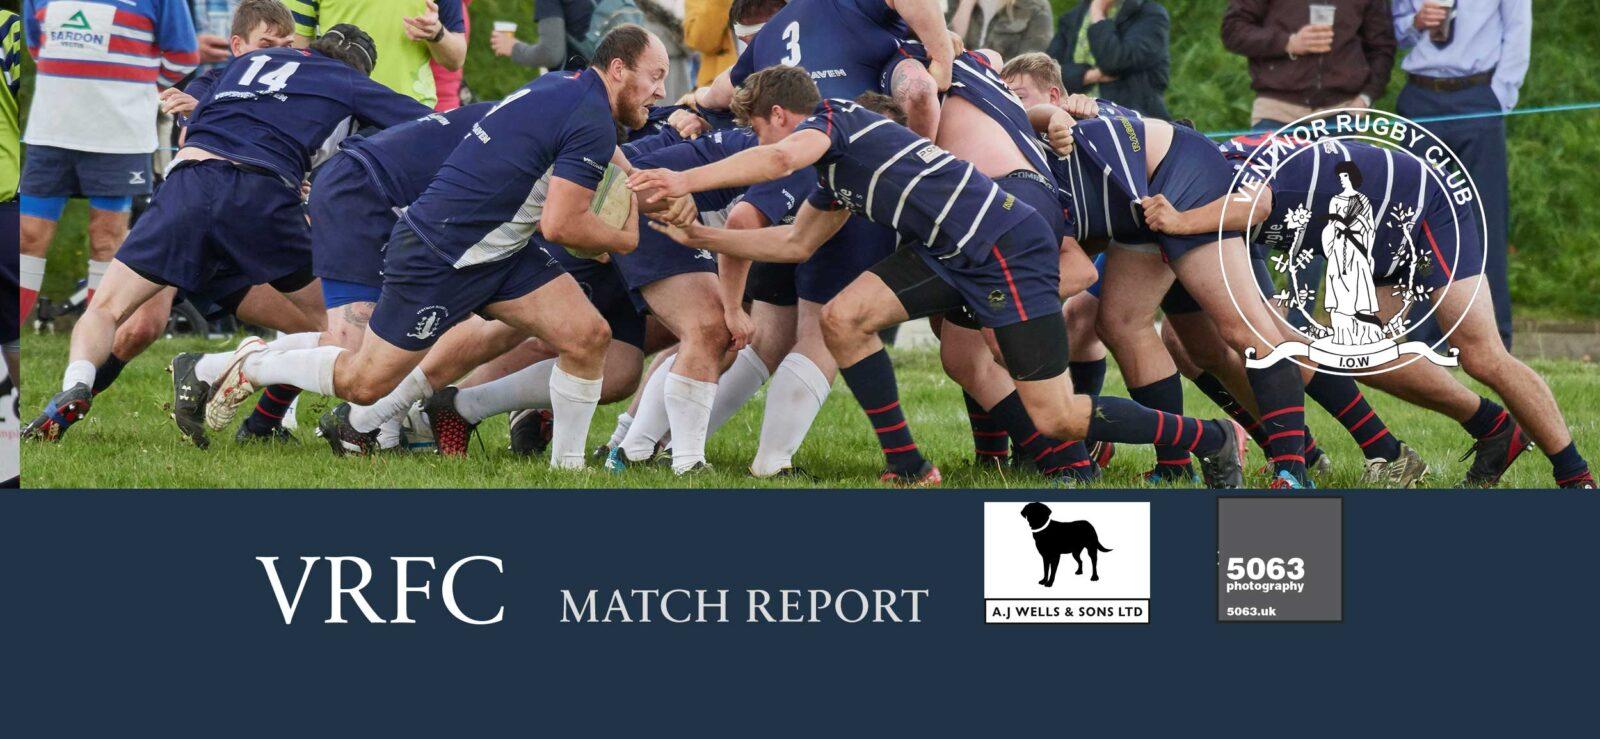 Match report: Sandown & Shanklin 1st XV RFC 63-17 Ventnor RFC 1st XV, 16 Sept 2017